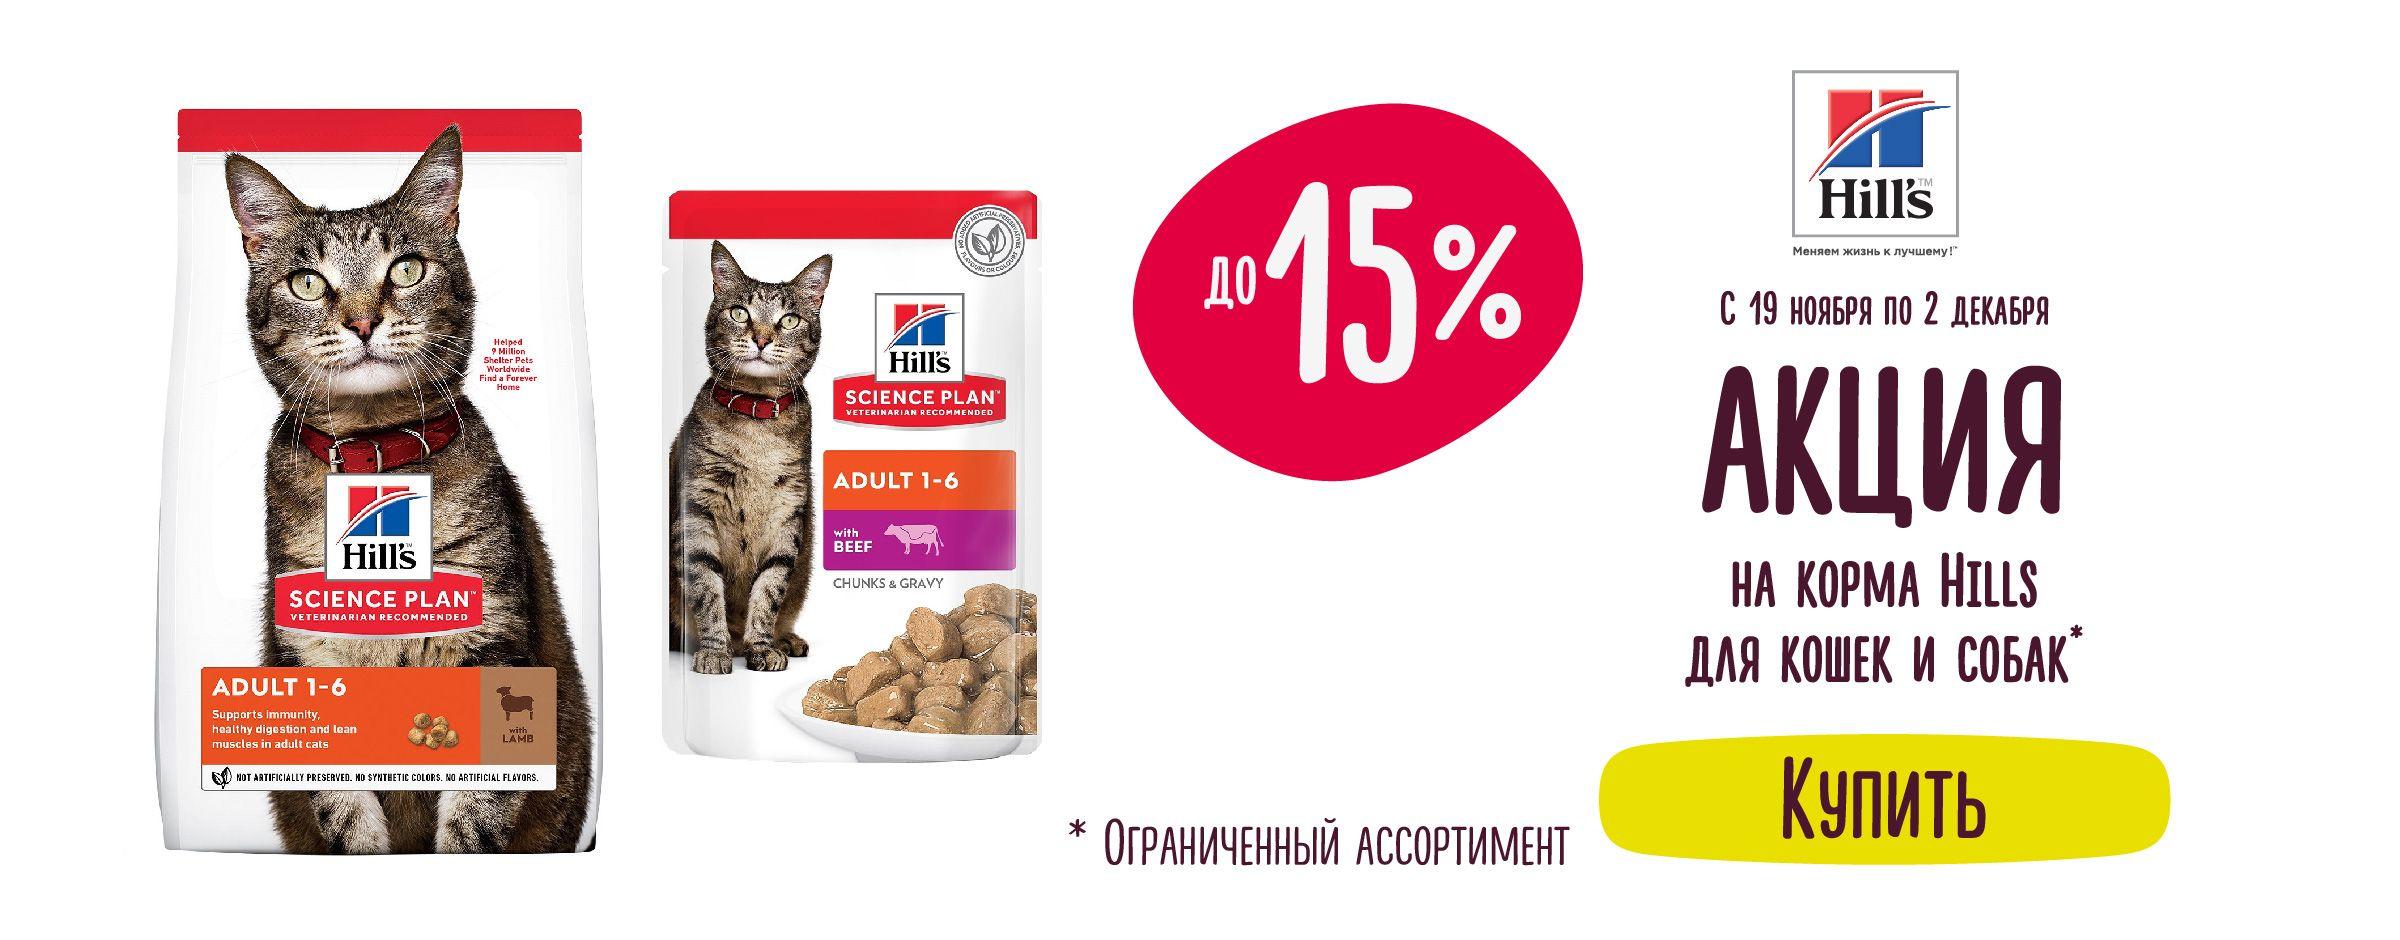 Скидка до 15% на корма Hills для кошек и собак== Листовка23